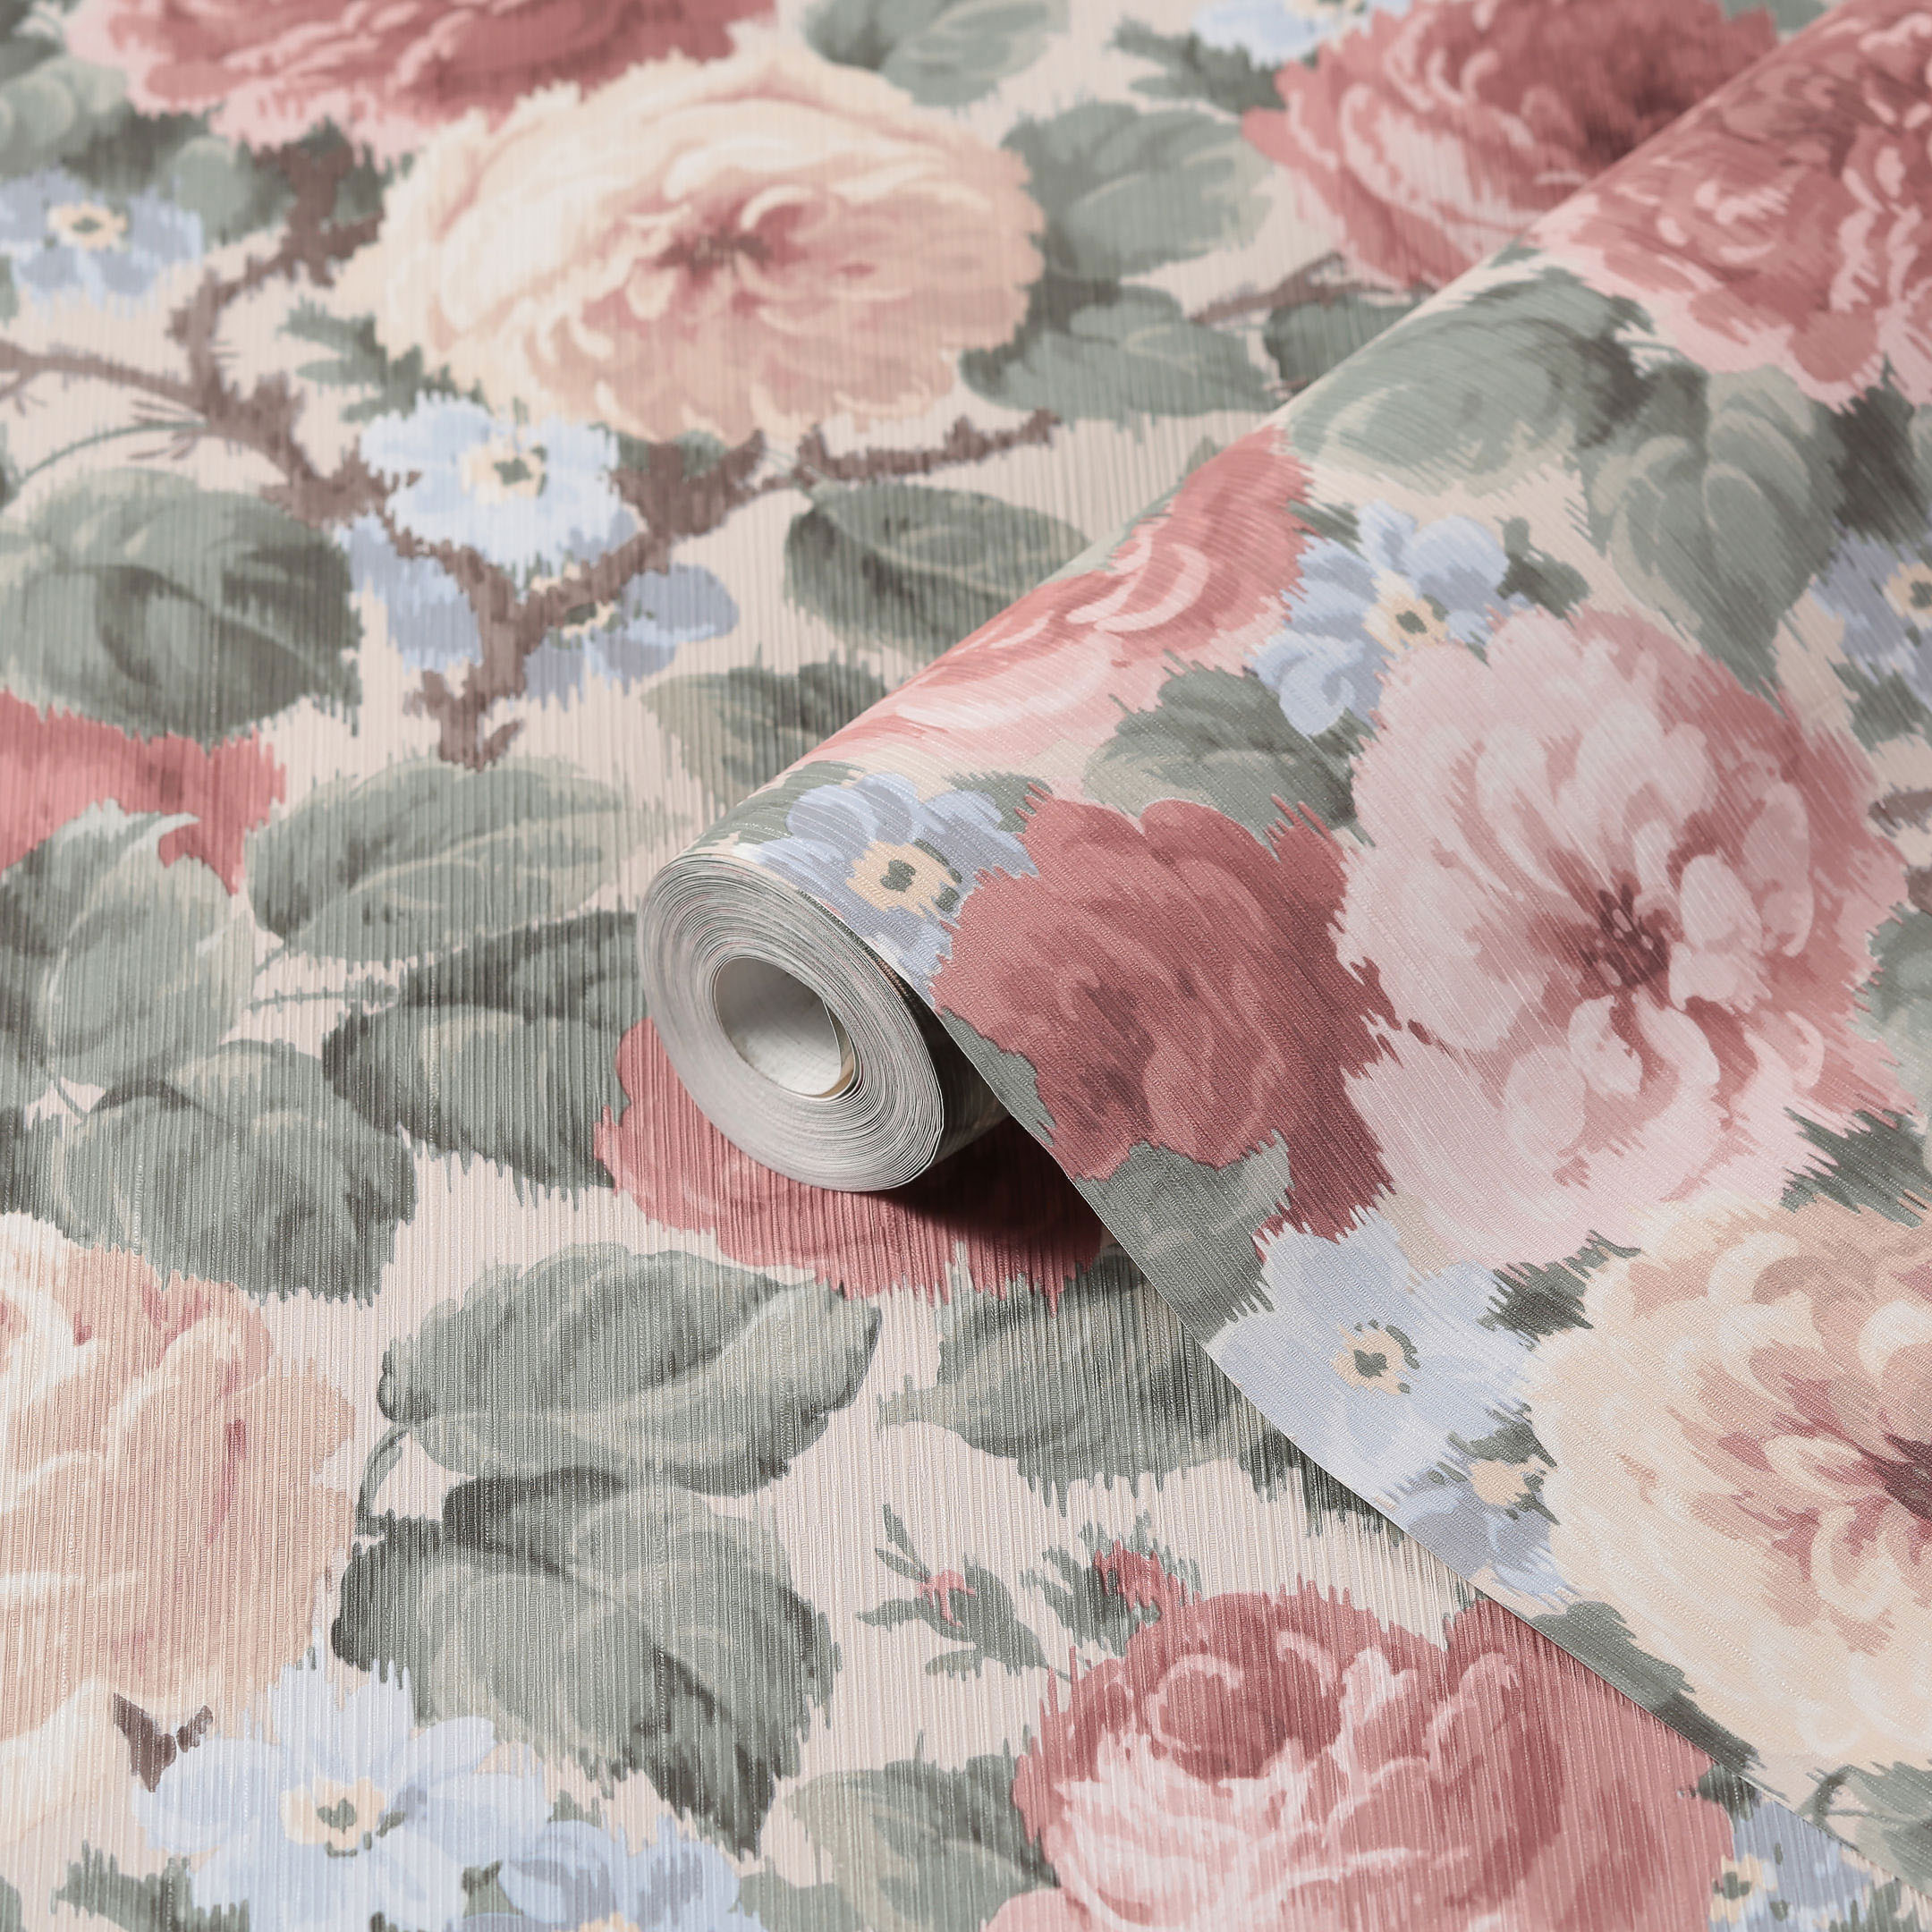 Обои компакт-винил на флизелиновой основе МИР Роза Гобелен 45-273-02 (1,06х10 м) обои компакт винил на флизелиновой основе мир роза гобелен 45 274 02 1 06х10 м